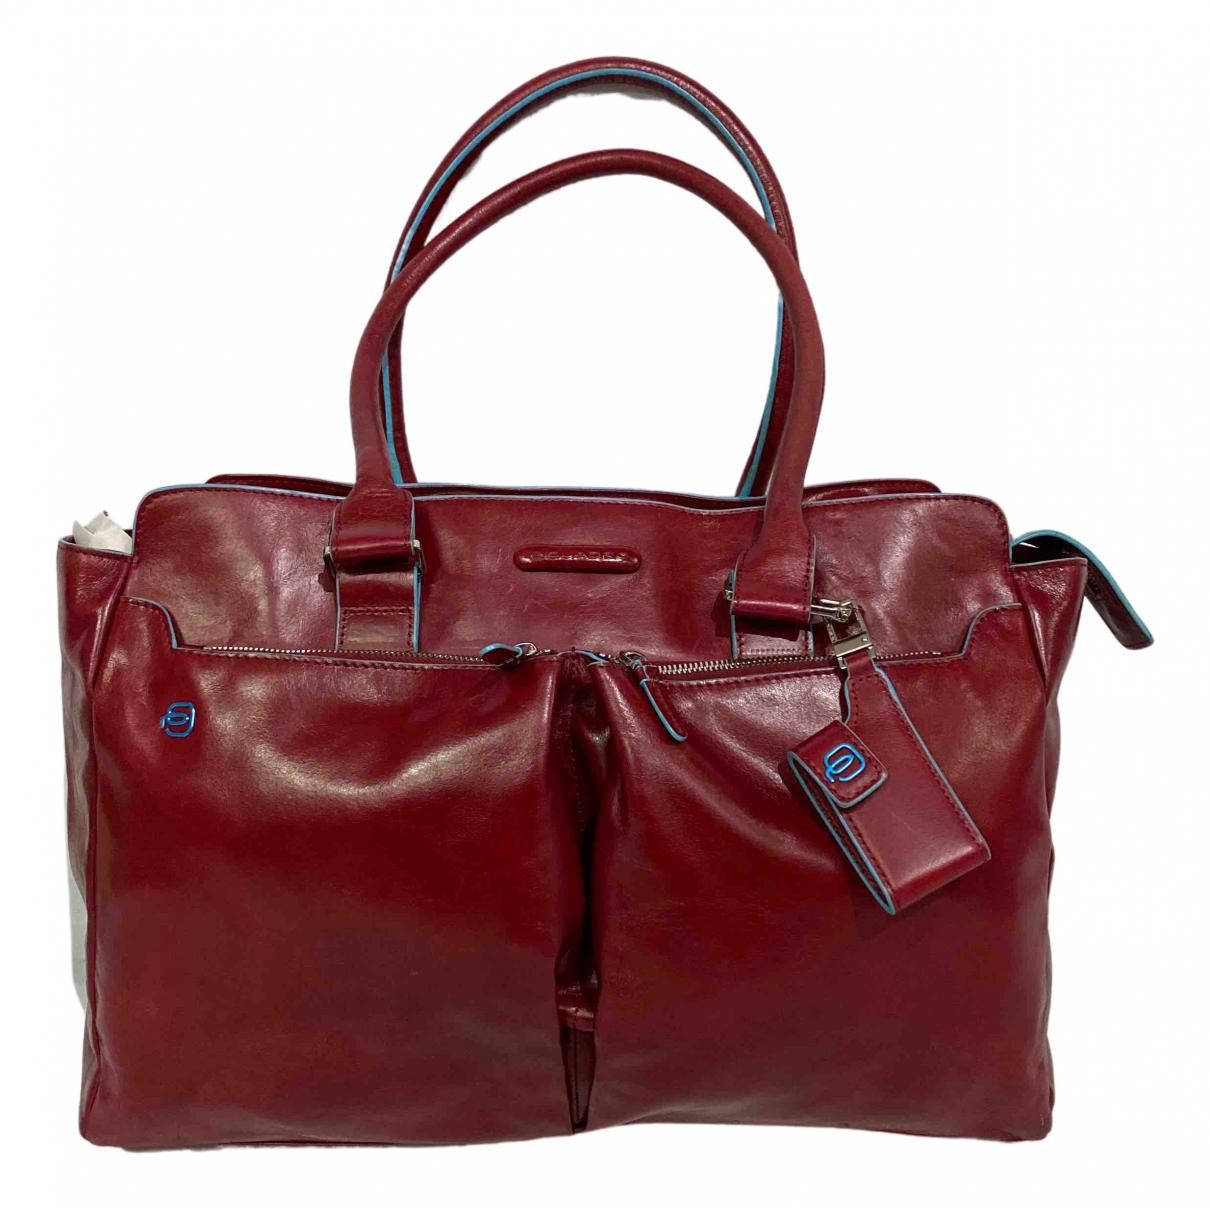 Piquadro N Red Leather handbag for Women N